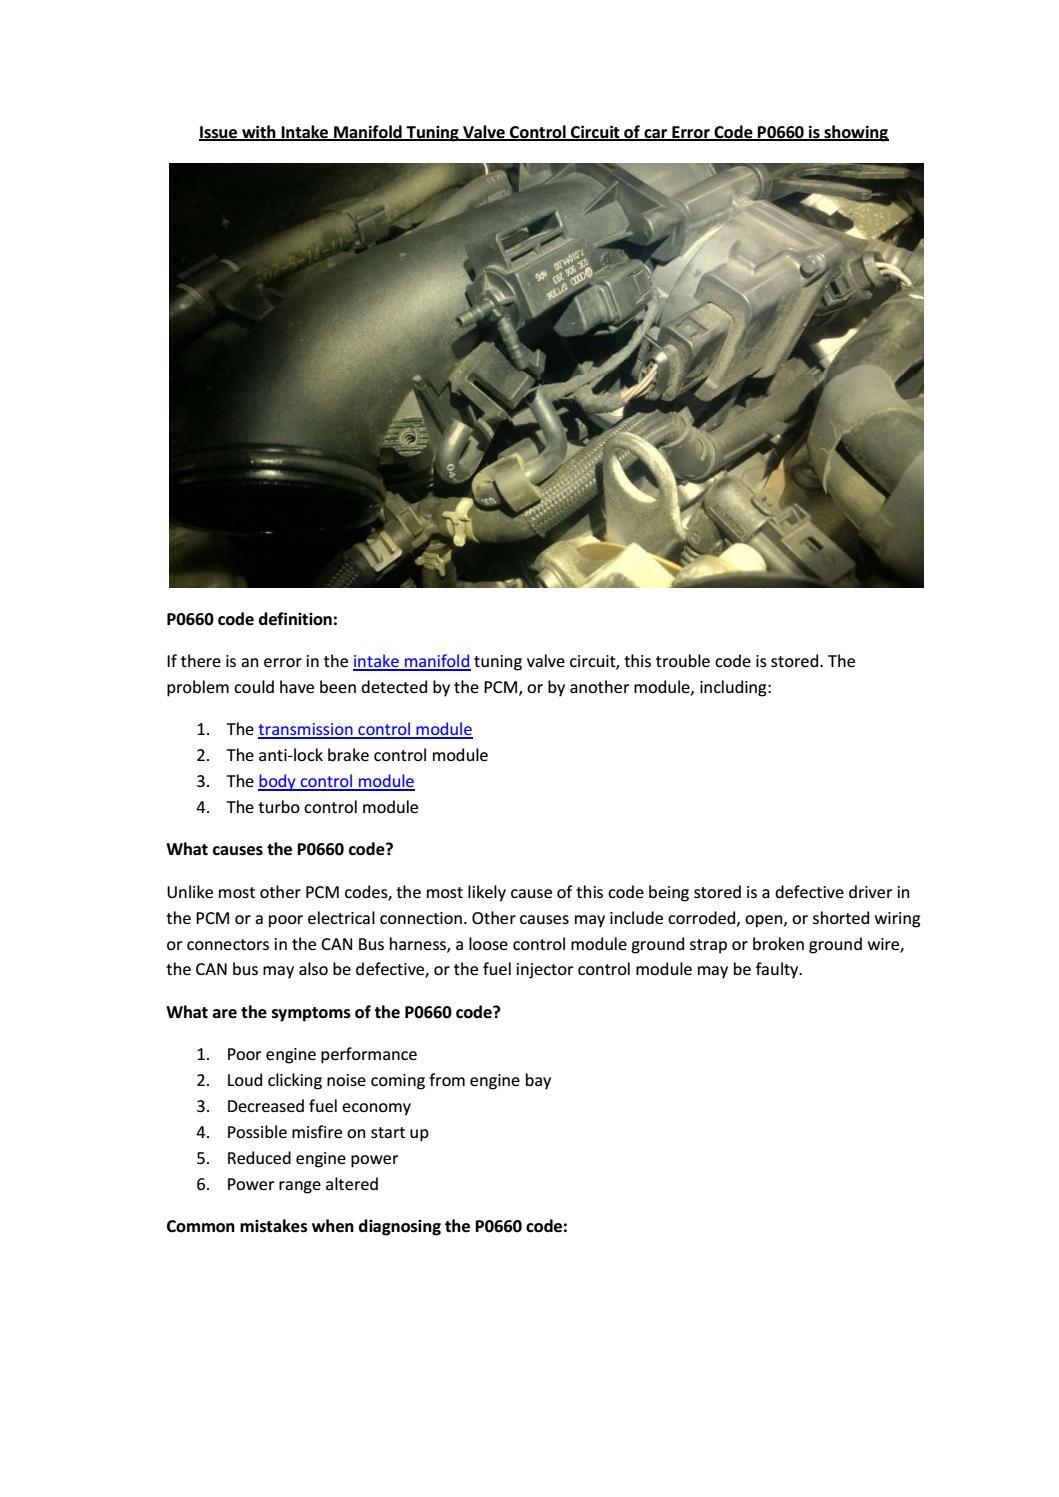 Partsavatar Car Parts, Canada - Issue with Intake Manifold Tuning